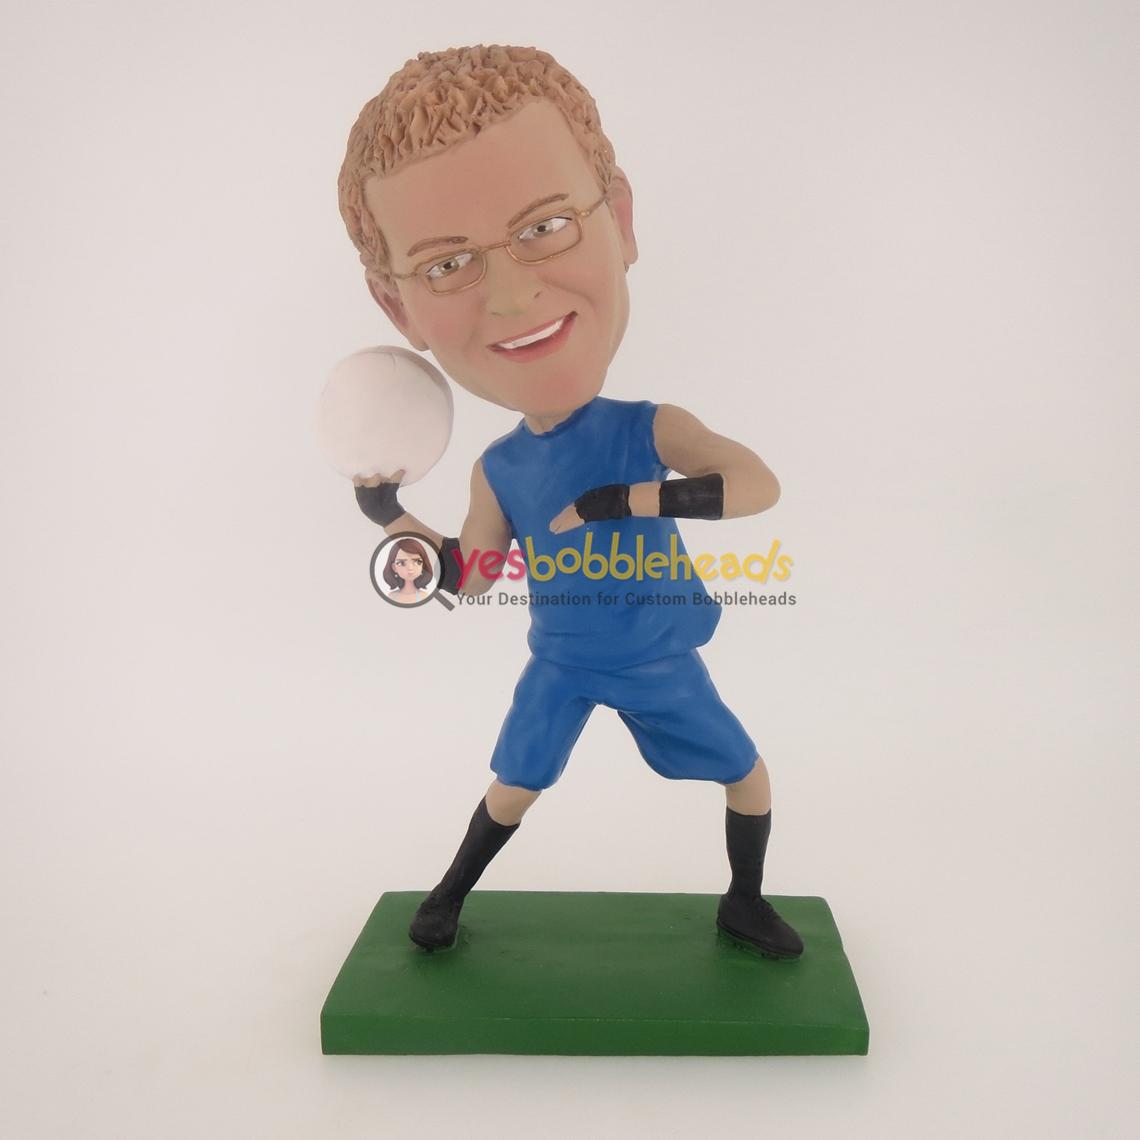 Picture of Custom Bobblehead Doll: Man Swing Softball